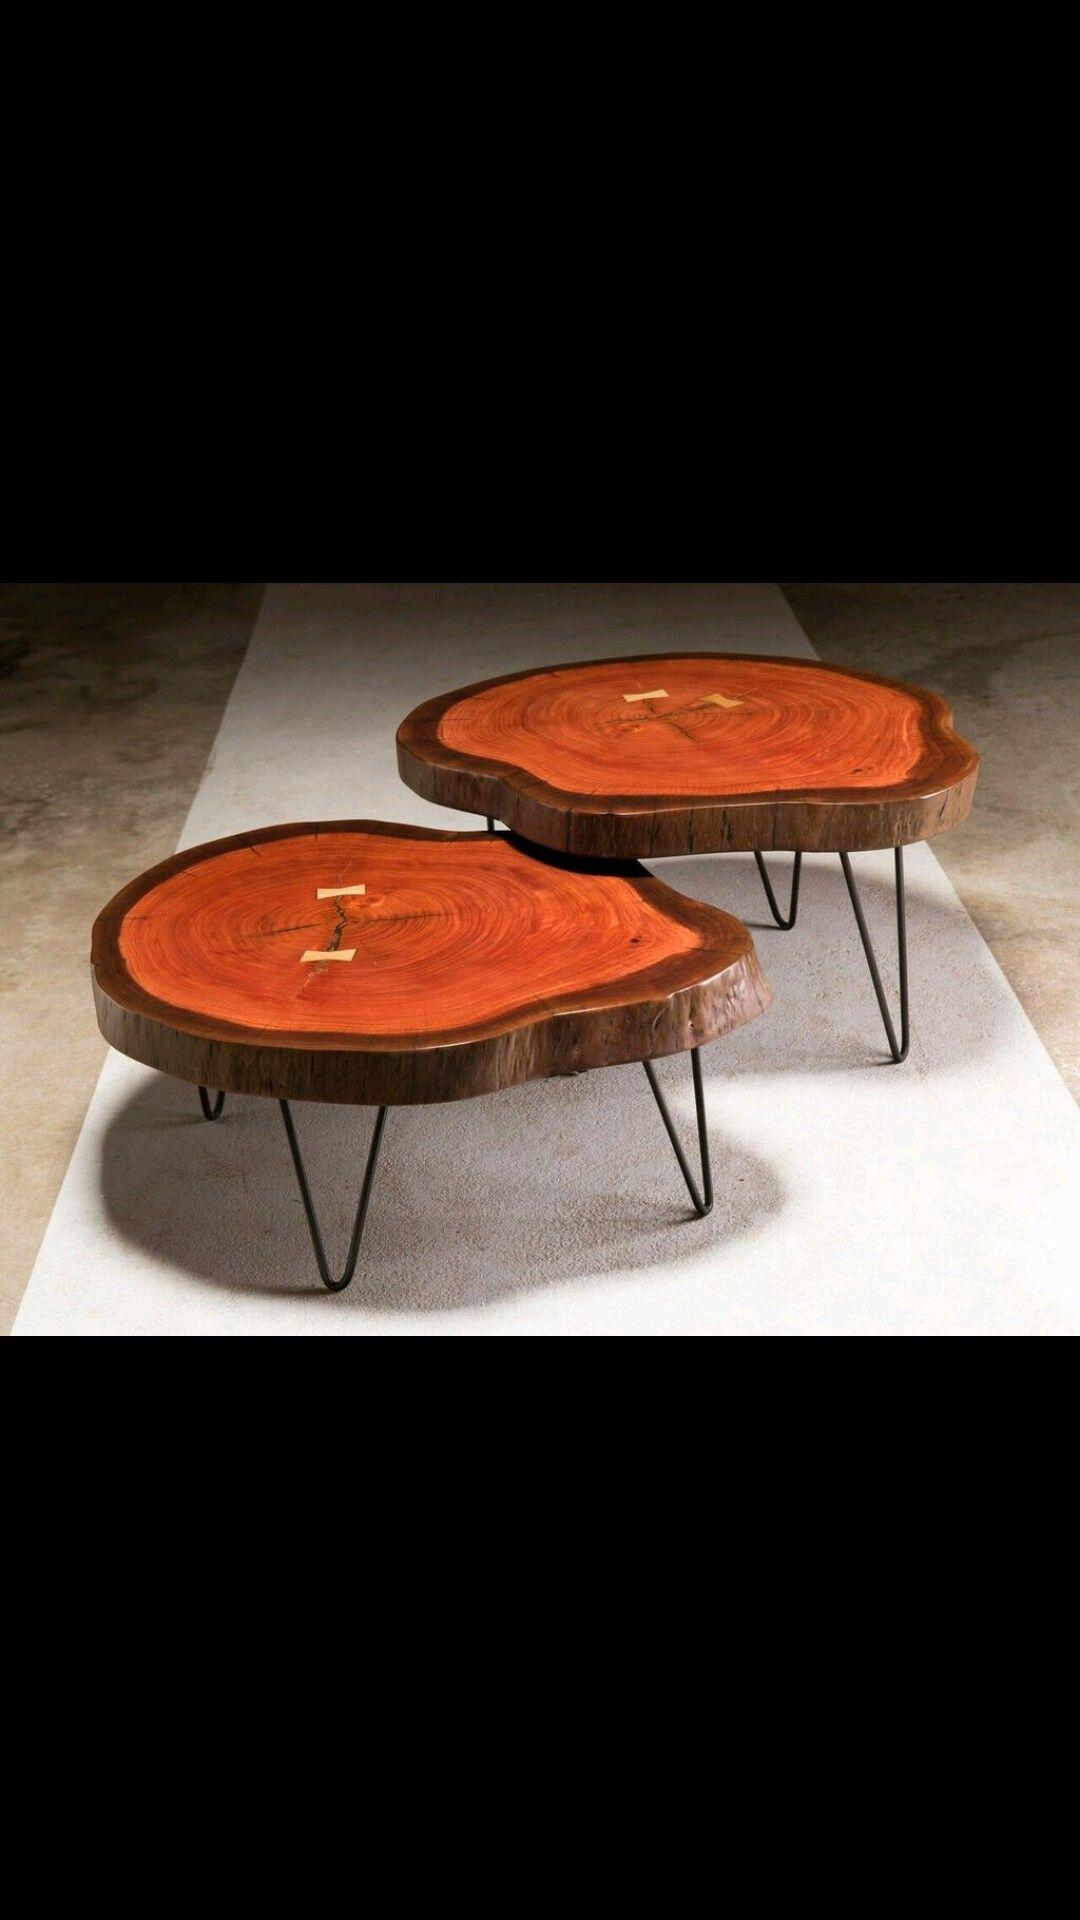 Eucalyptus Wood Table Coffee Table Wood Table Table